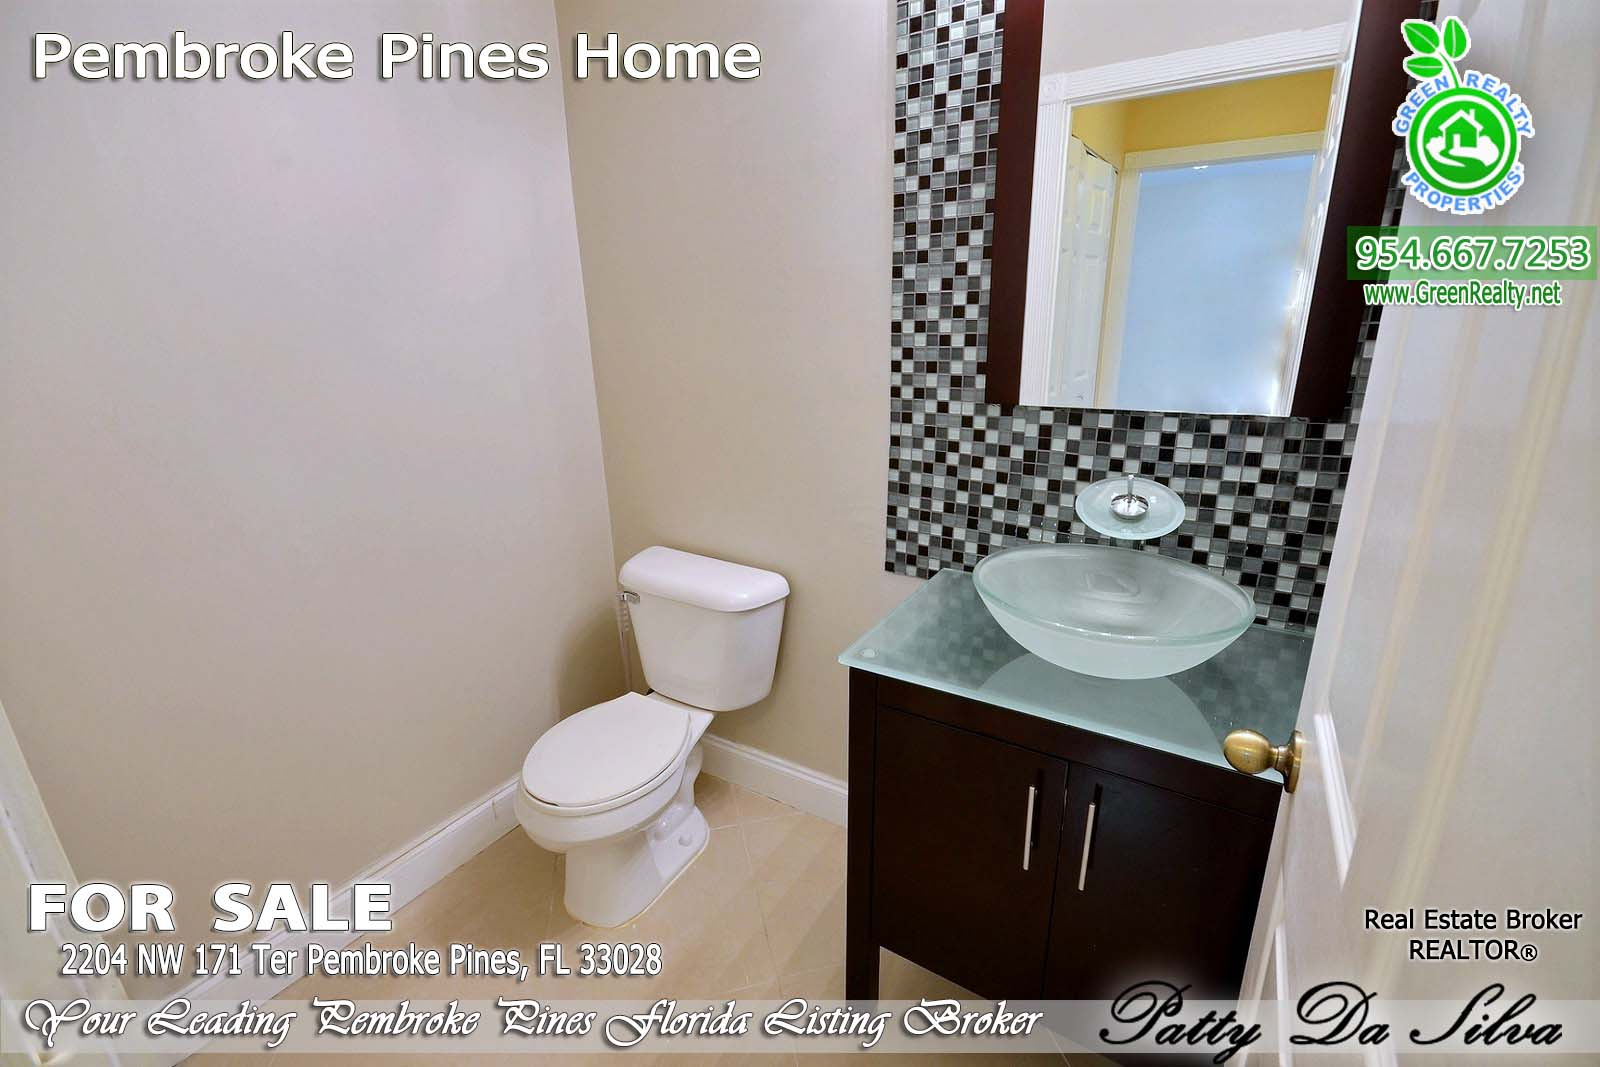 Pembroke Pines Homes For Sale - Pembroke Isles (6)